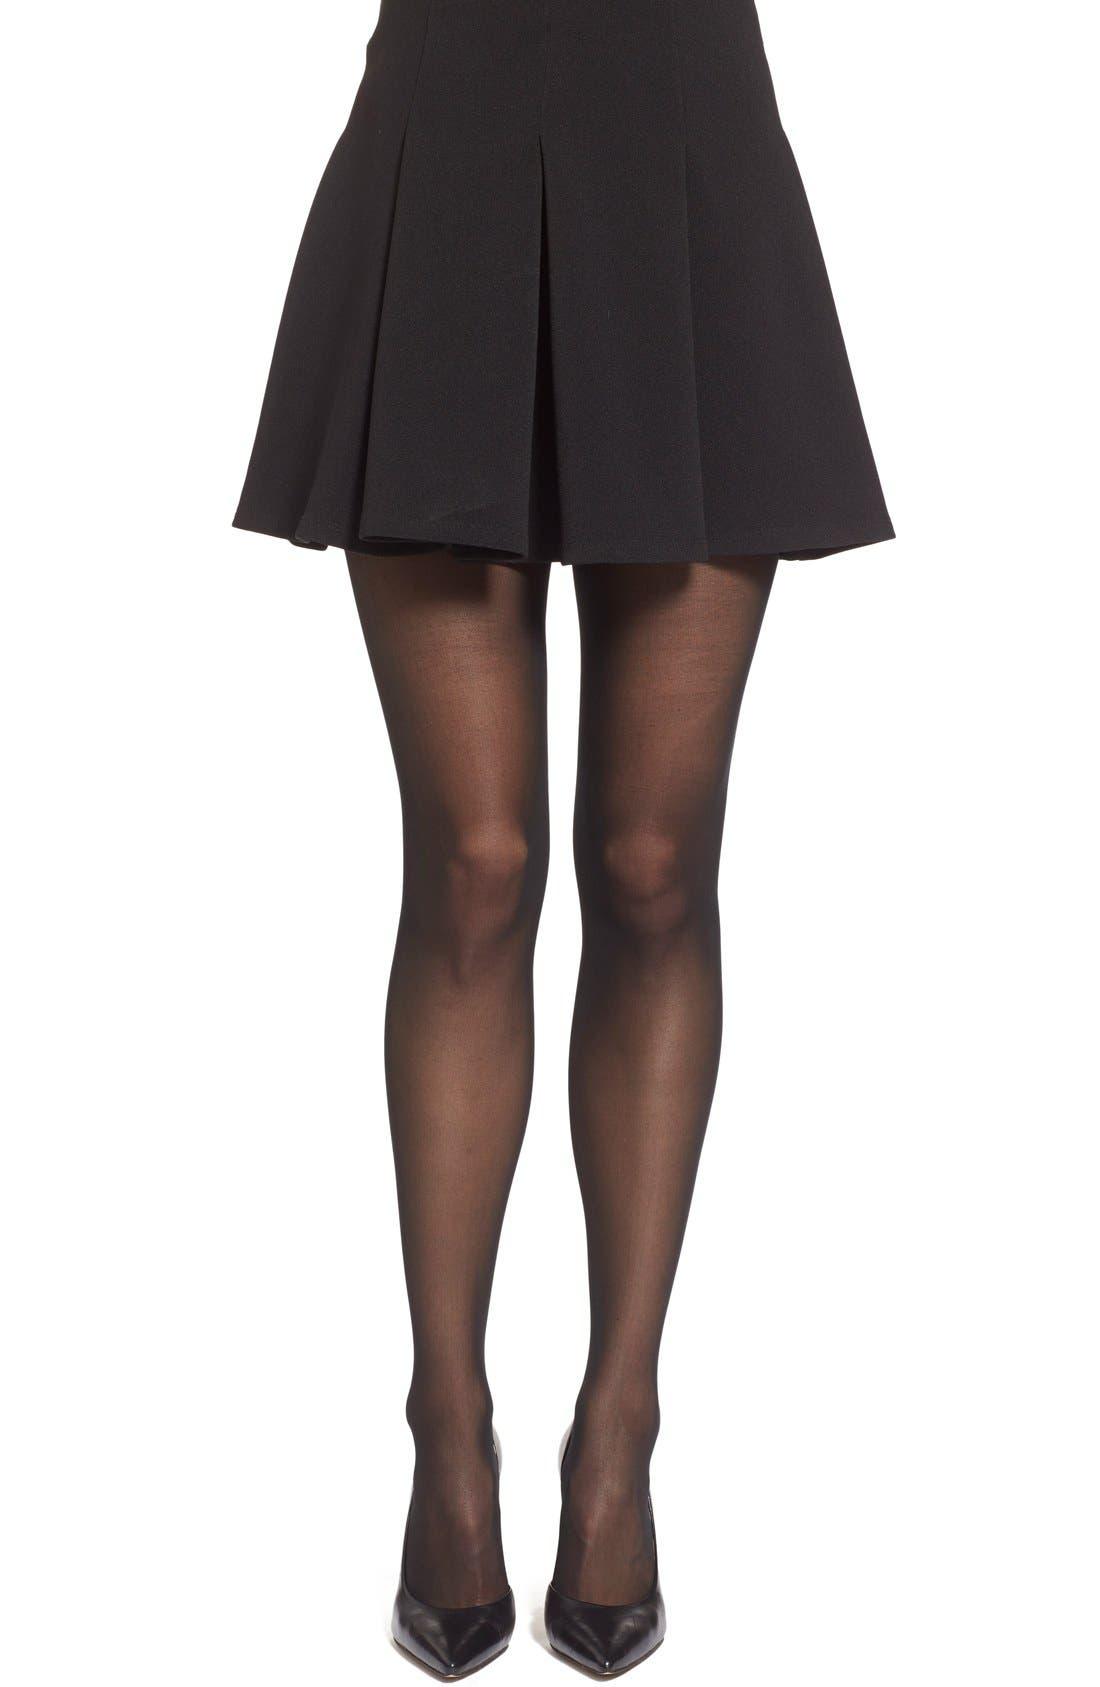 Main Image - Falke 'Bijou' Sheer Stockings